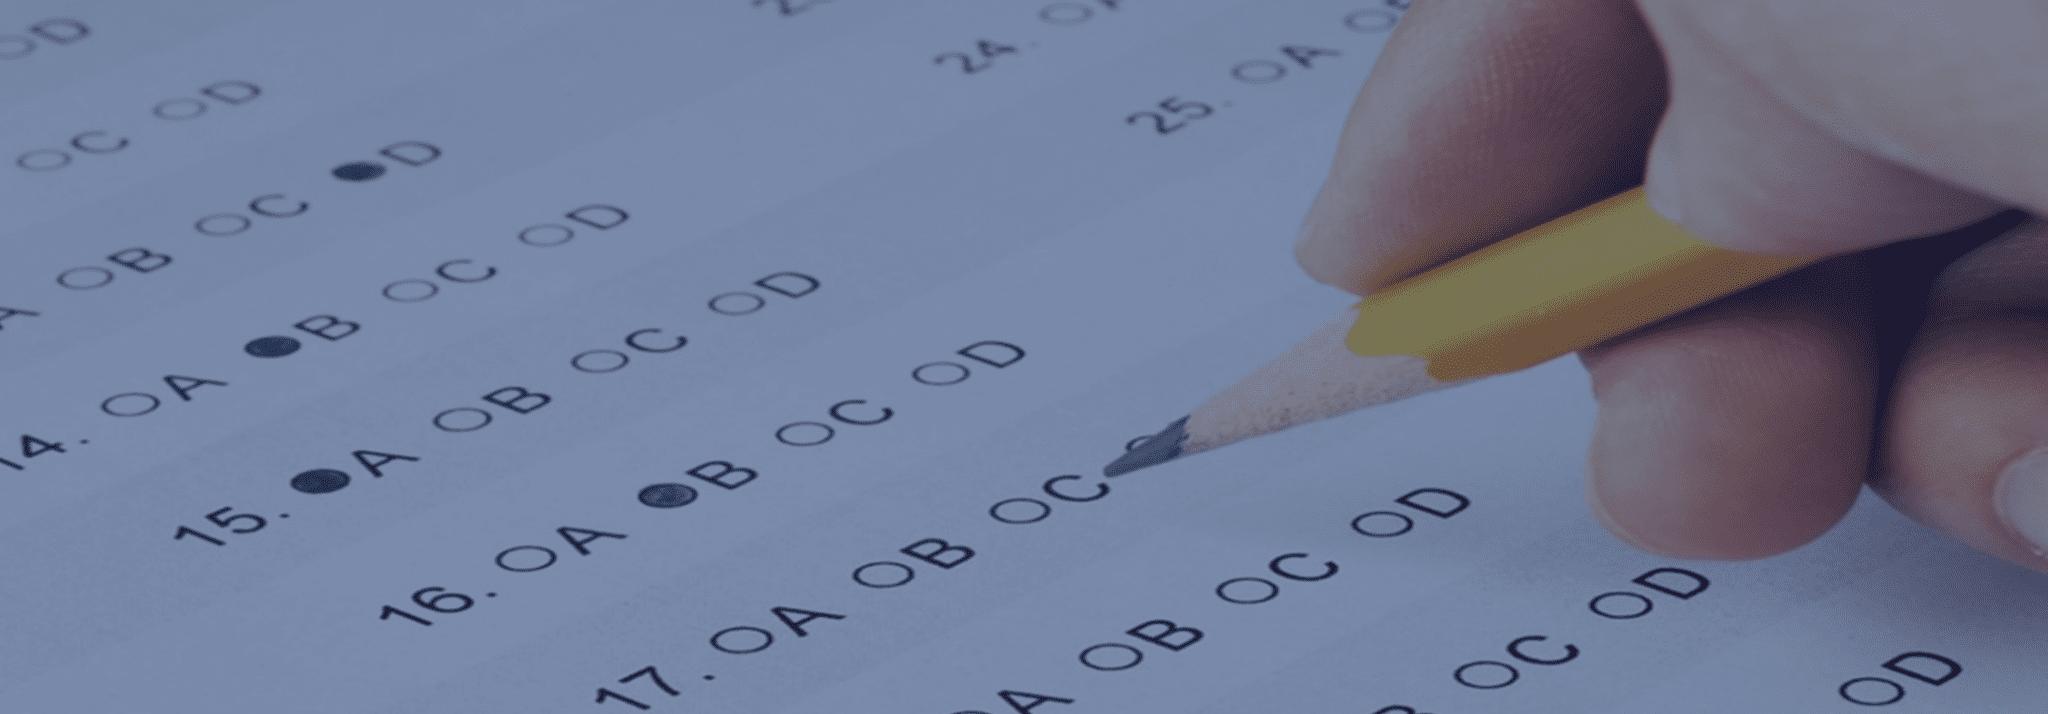 State Exam Information | California Distribution Operator Certification